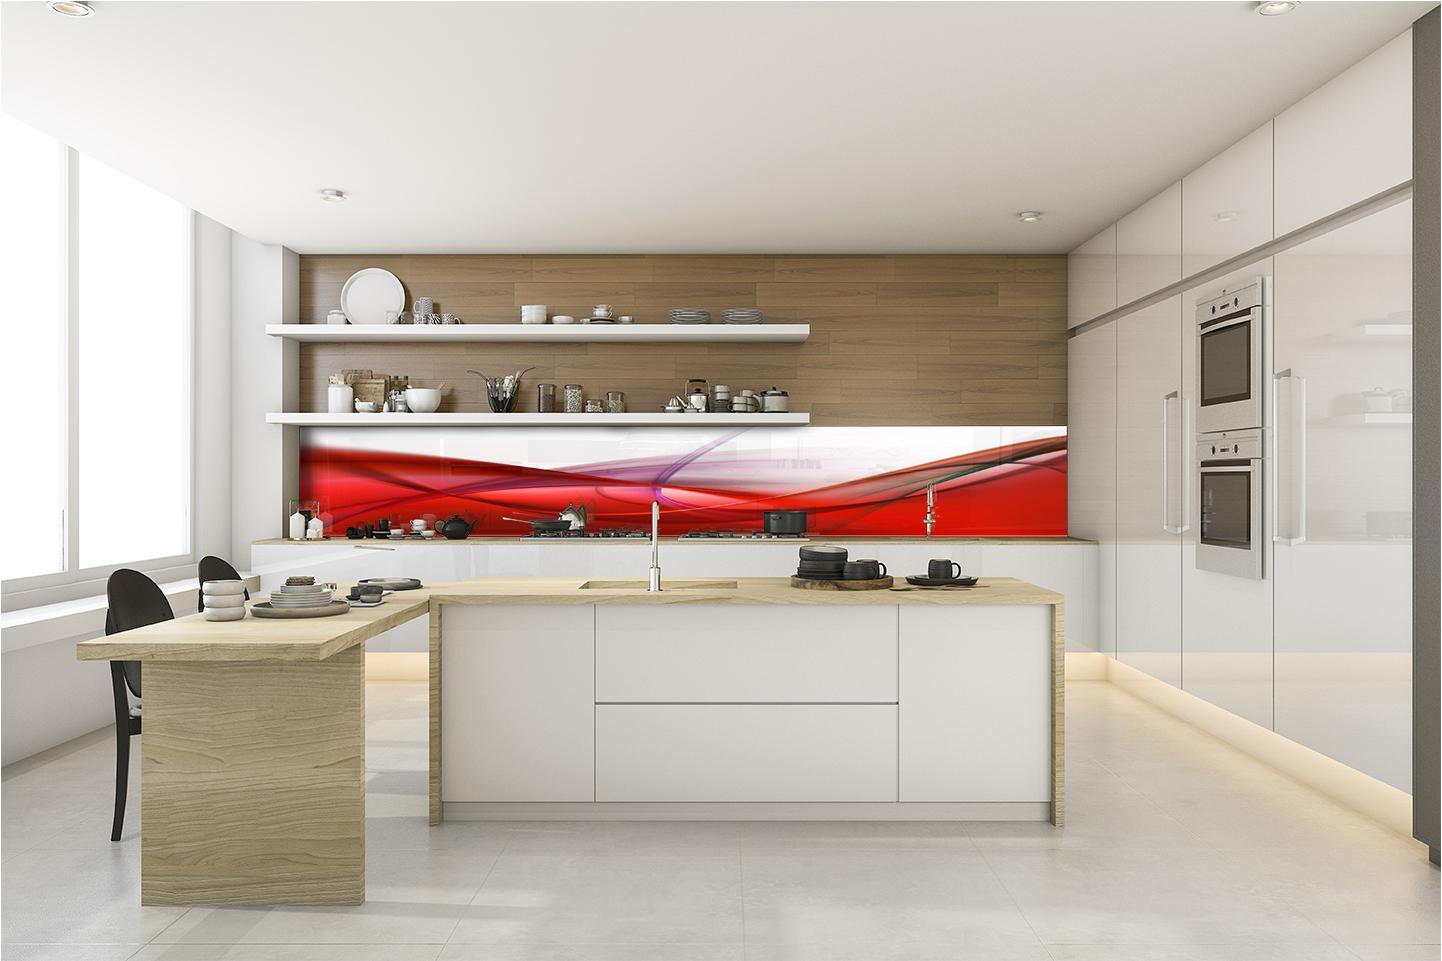 Paraschizzi rivestimento da parete cucina moderna astratto rosso linee bianco ebay - Rivestimento cucina bianco ...